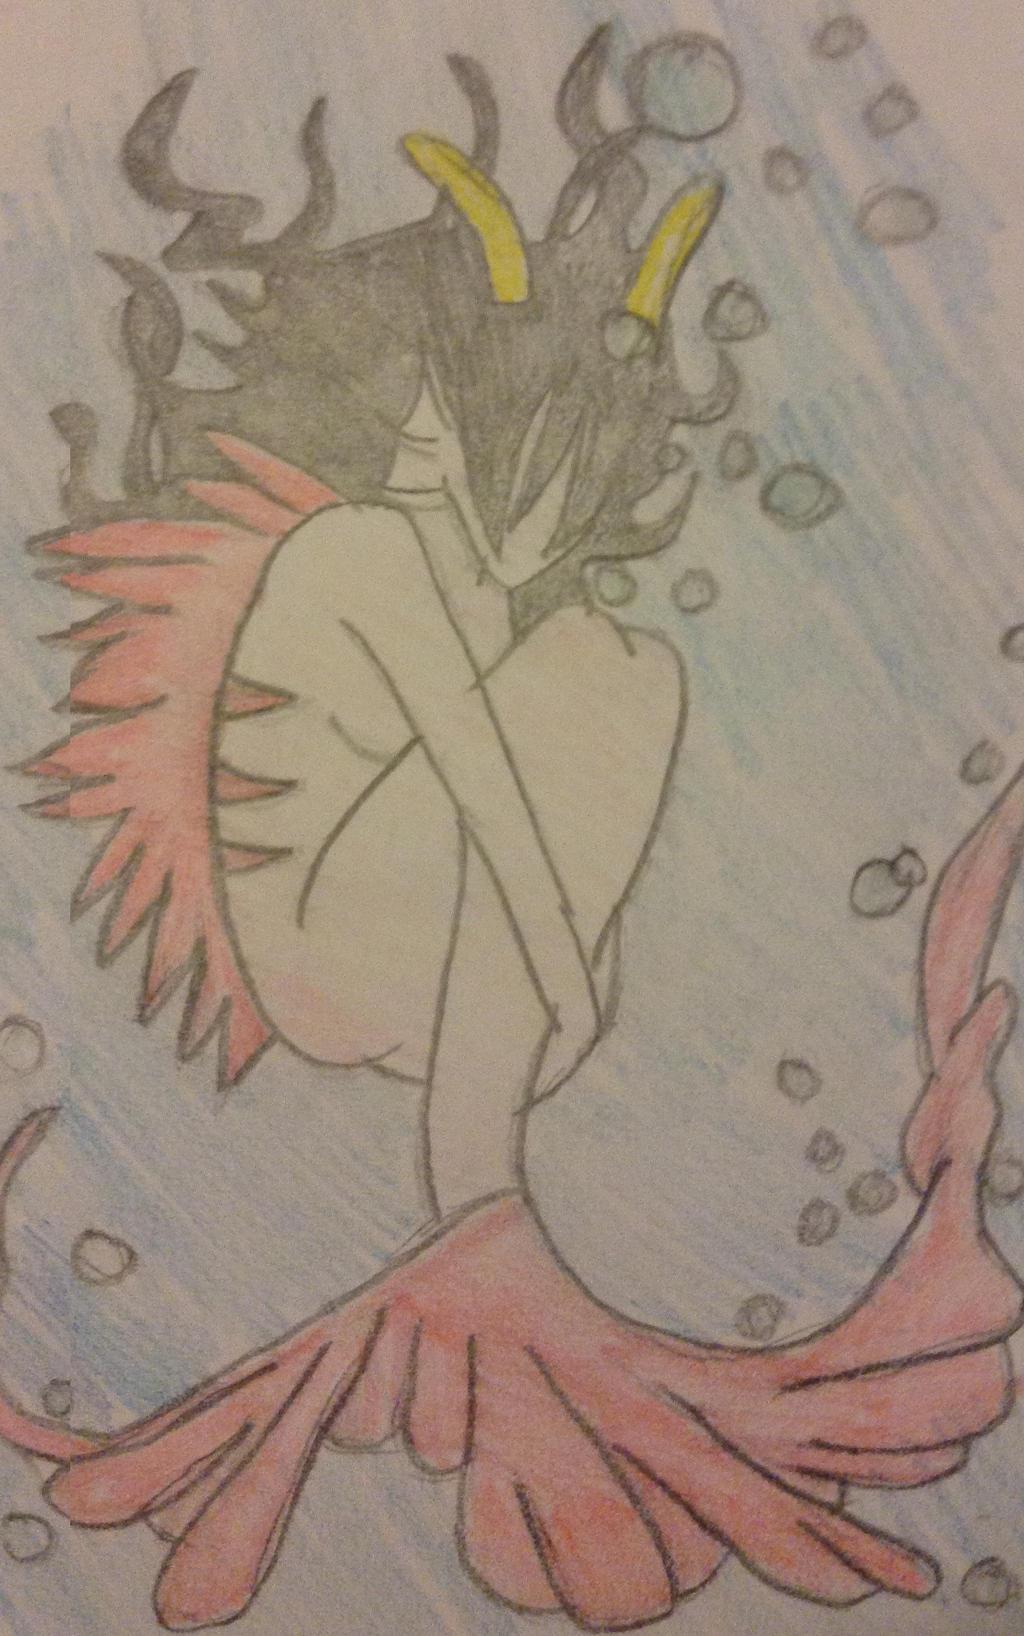 Fef the Mermaid [HS] (doodle) by WhiteBleedingFox